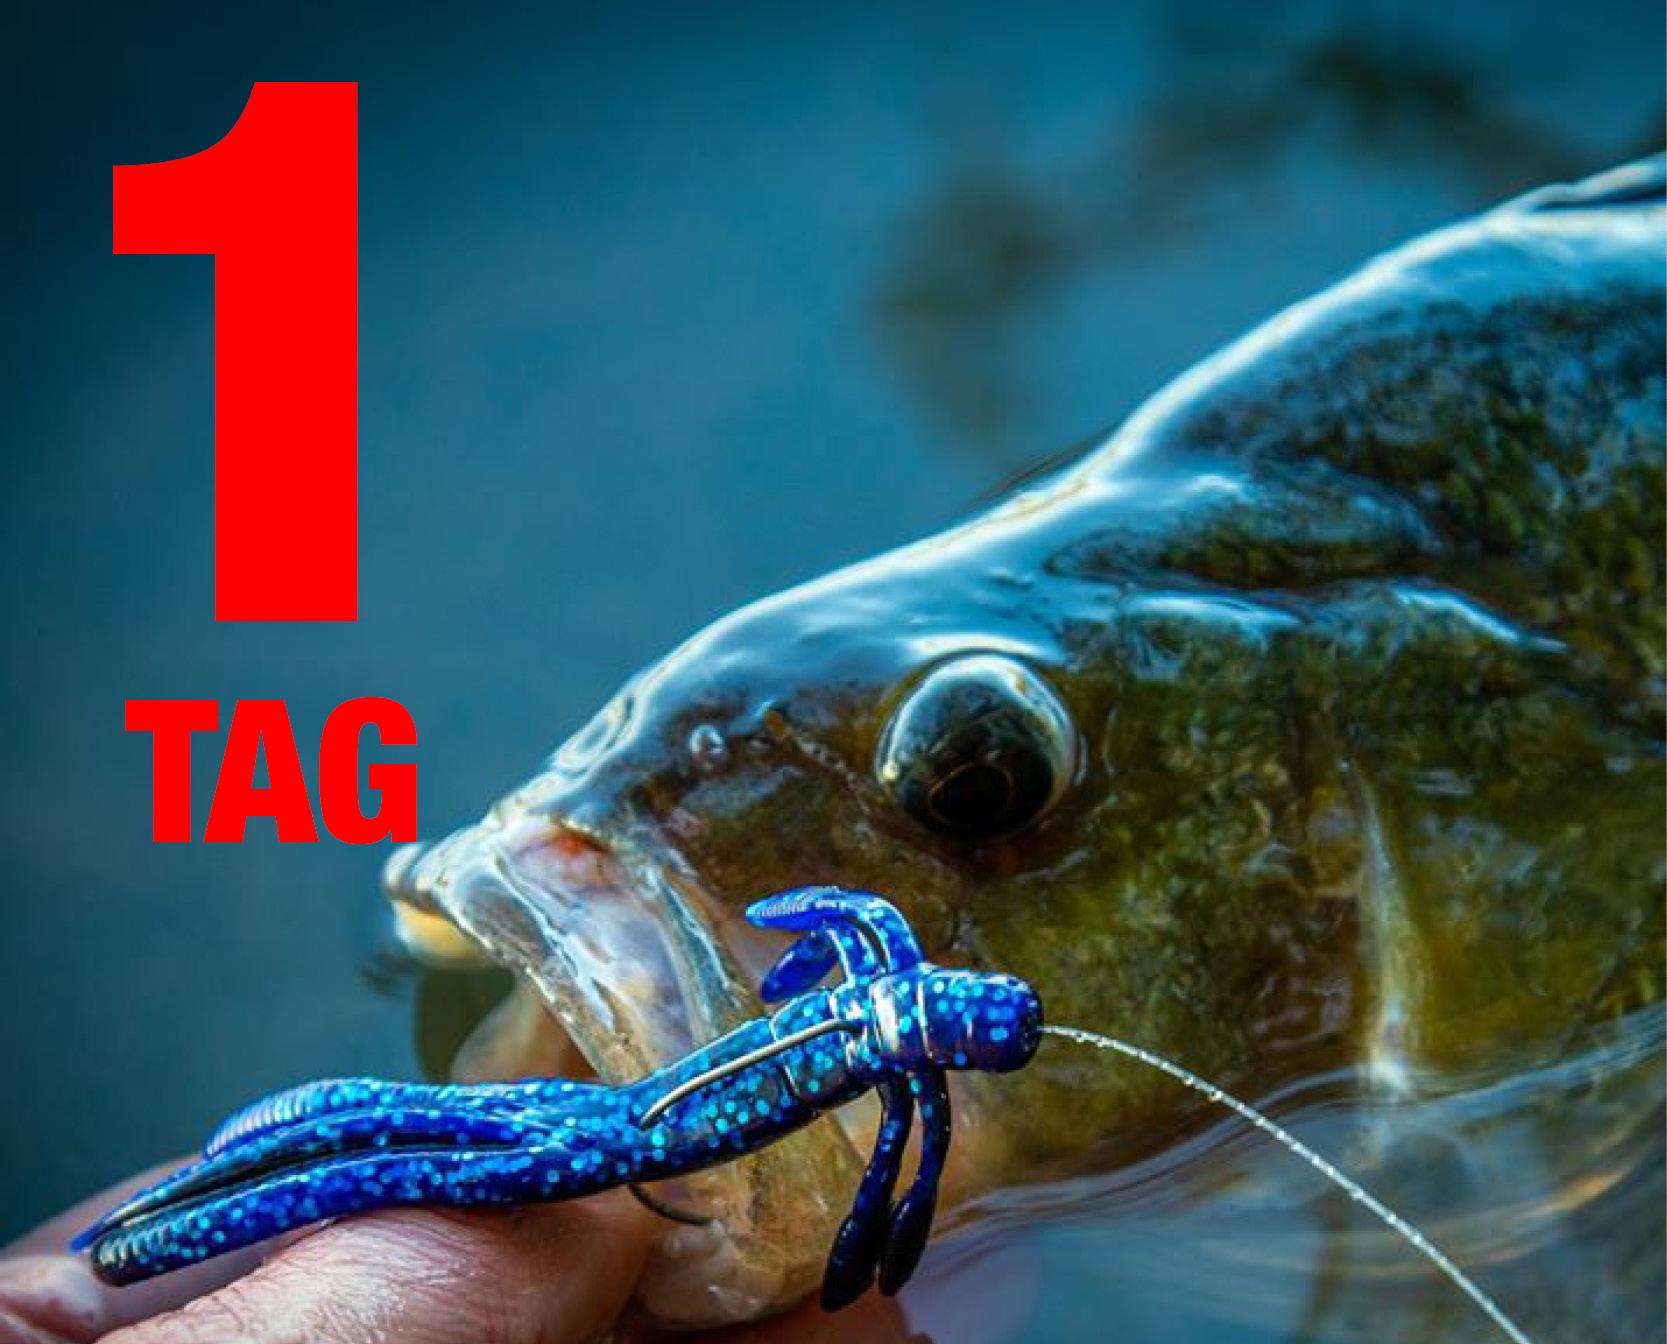 Catch more Fish_facebook_Quadrate_1.jpg